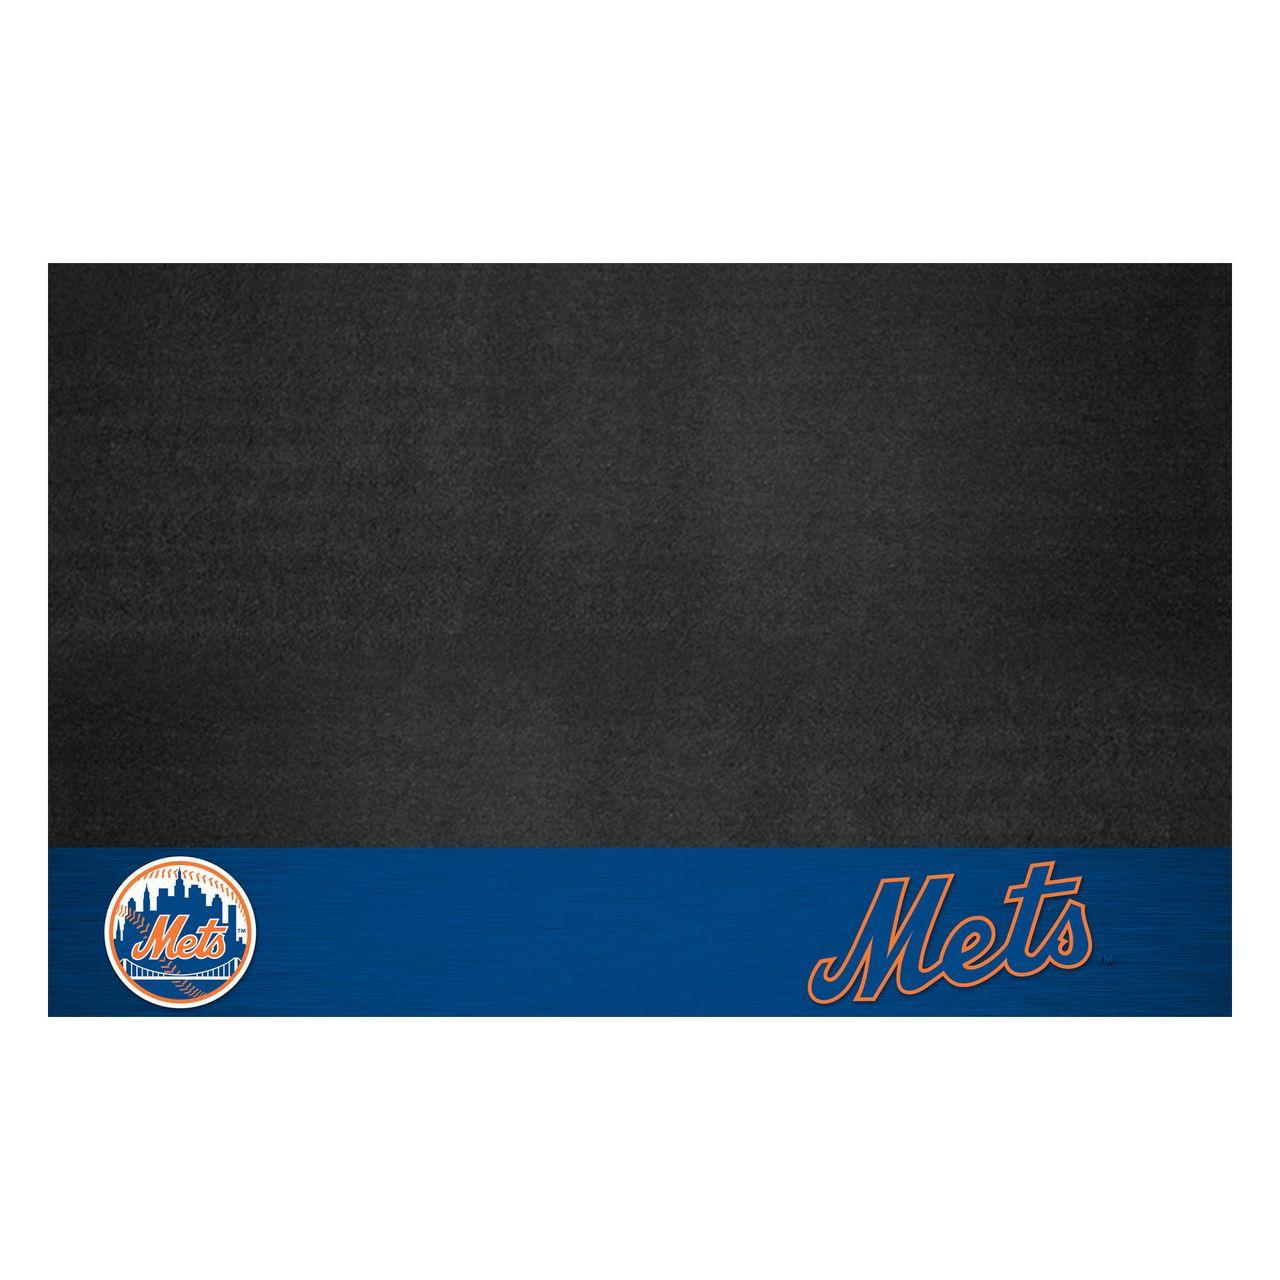 "Fanmats 12161 MLB - New York Mets Grill Mat 26""x42"""